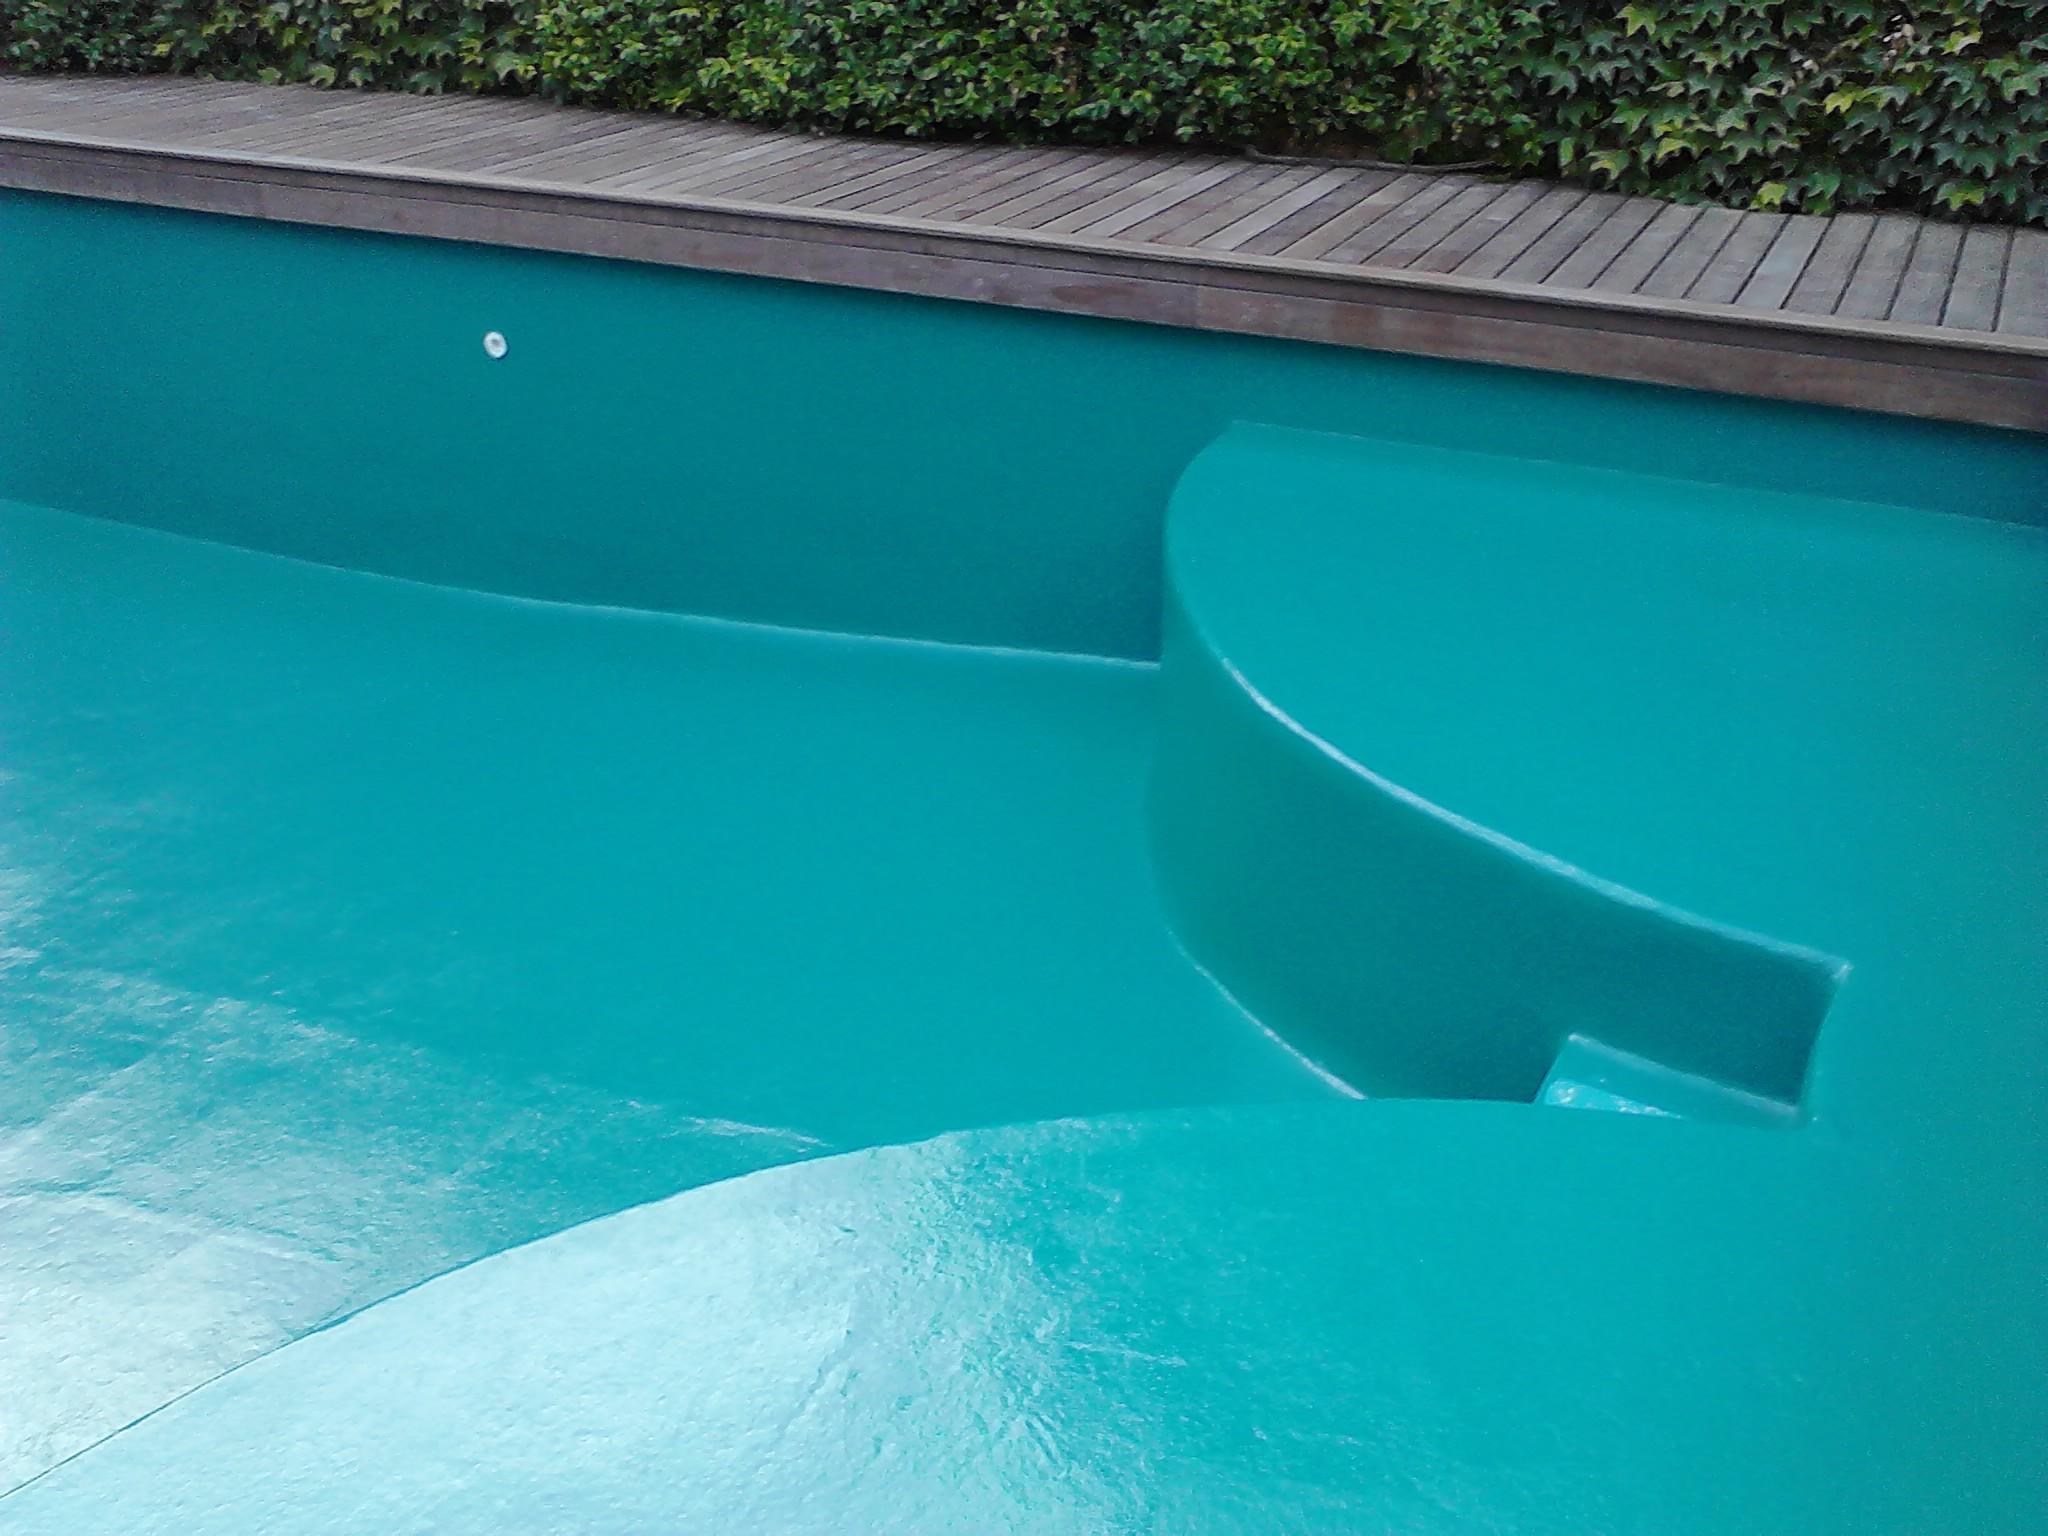 piscine polyester et Gelcoat bleu/vert sur commande